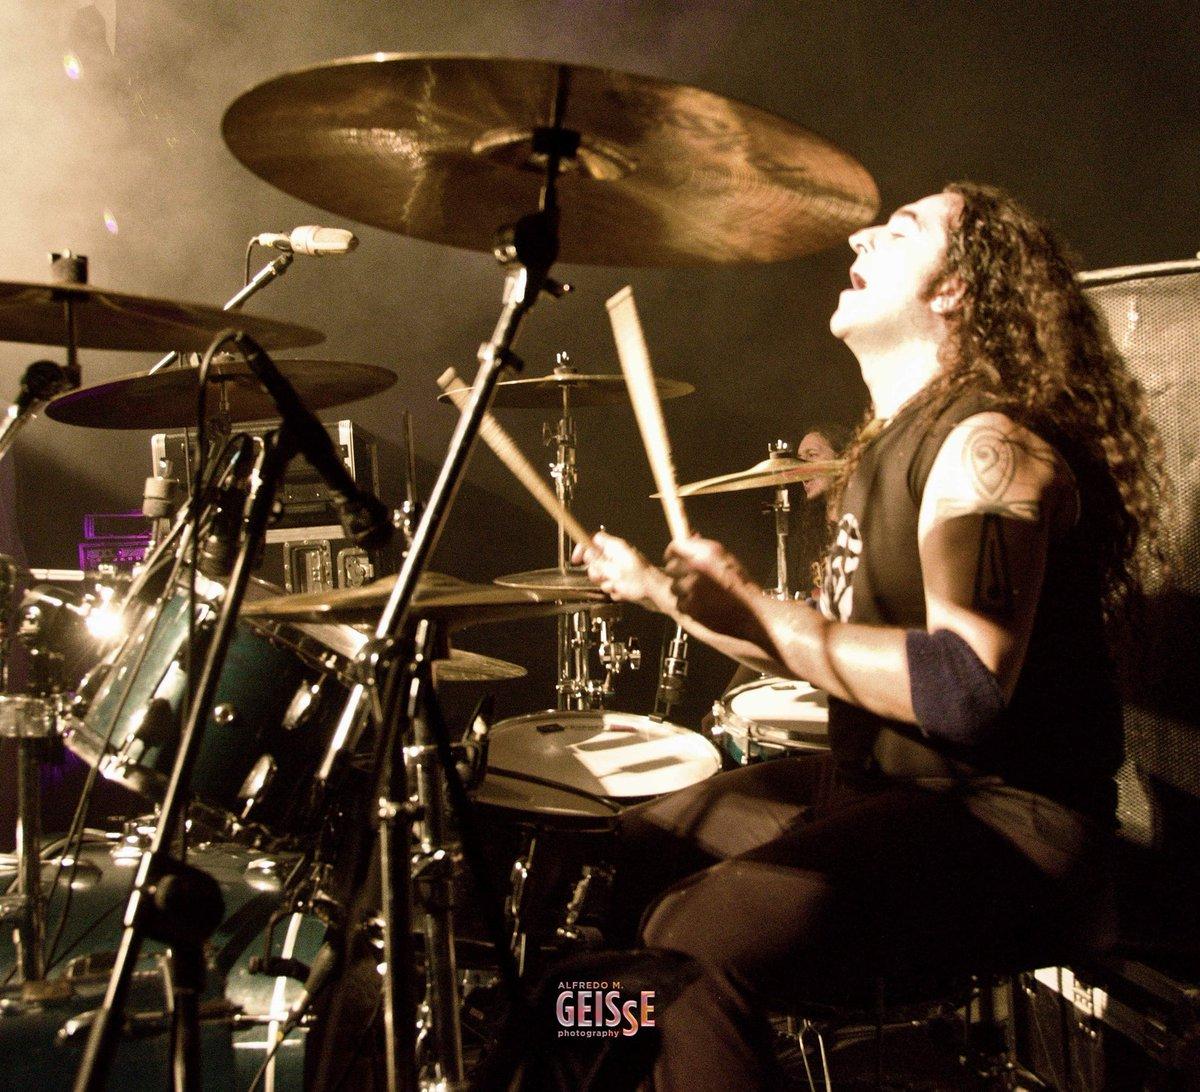 Don't let the dream fall.  Pic by #AlfredoMGeisse  . . . . #neversurrender #JoseUDrums #instadrummer #drumsdrumsdrums #drumstagram #drum #drummer #paiste #evans #pearl #meinl #uv1 #metronome #drumworld #DrumLife #MondayMotivation #DiaDpic.twitter.com/hBmkTYRVFA